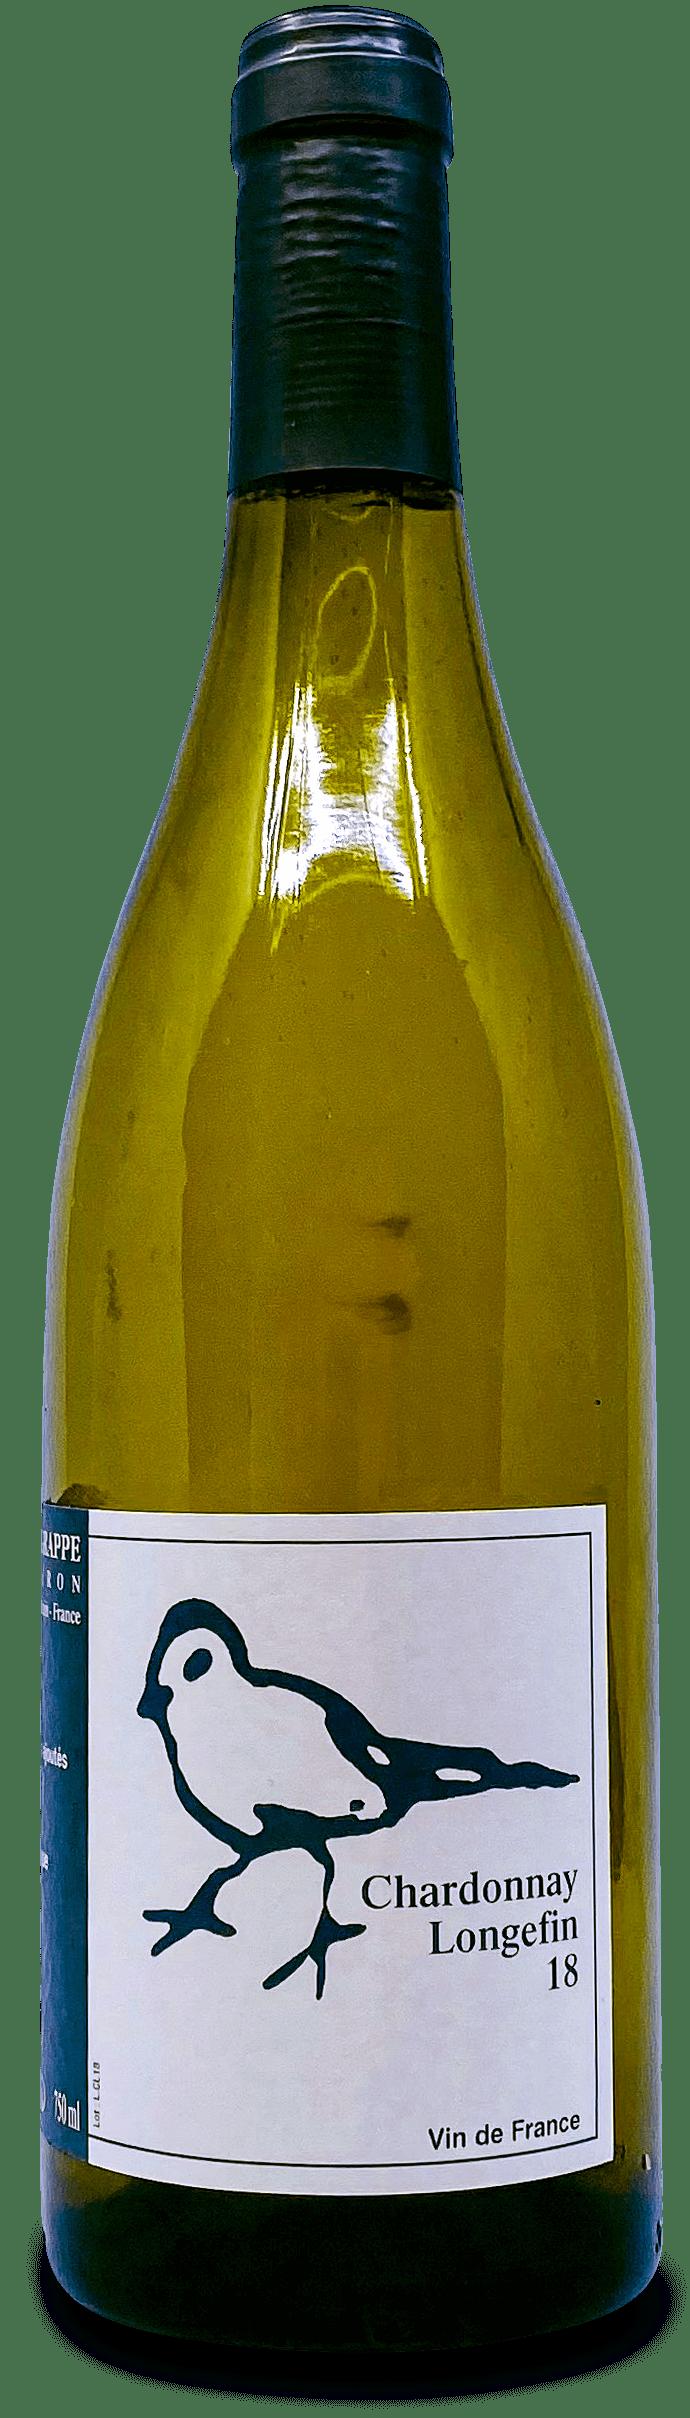 Chardonnay Longefin - Vinsupernaturel